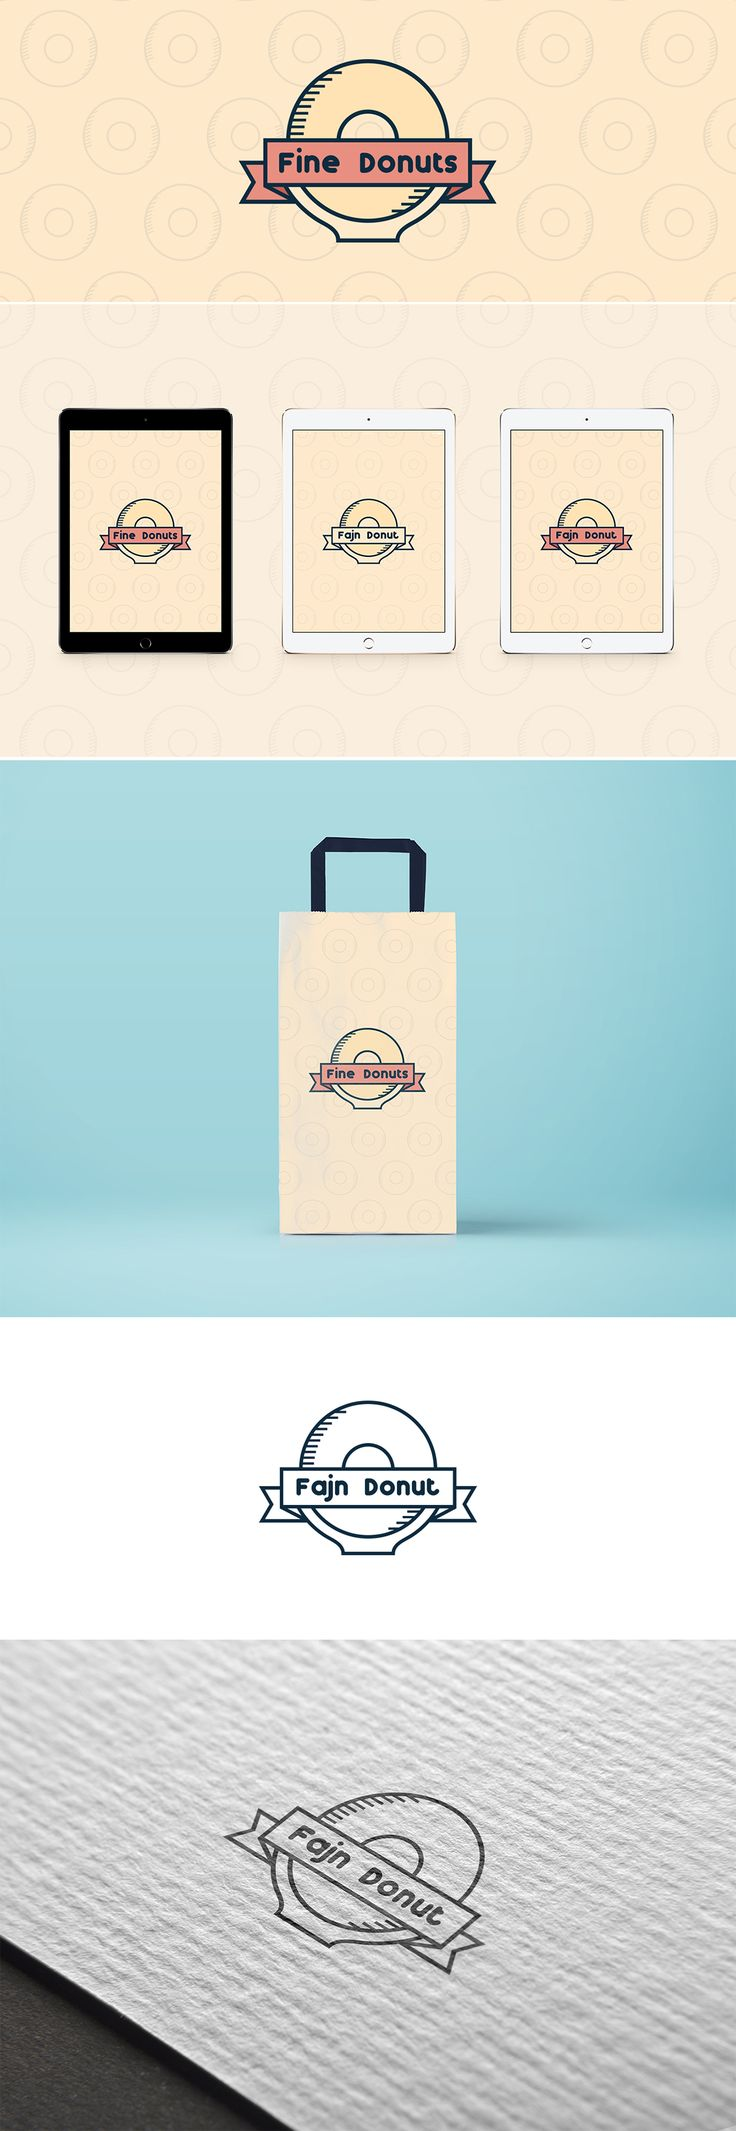 Fine Donuts 2 - logo on Behance